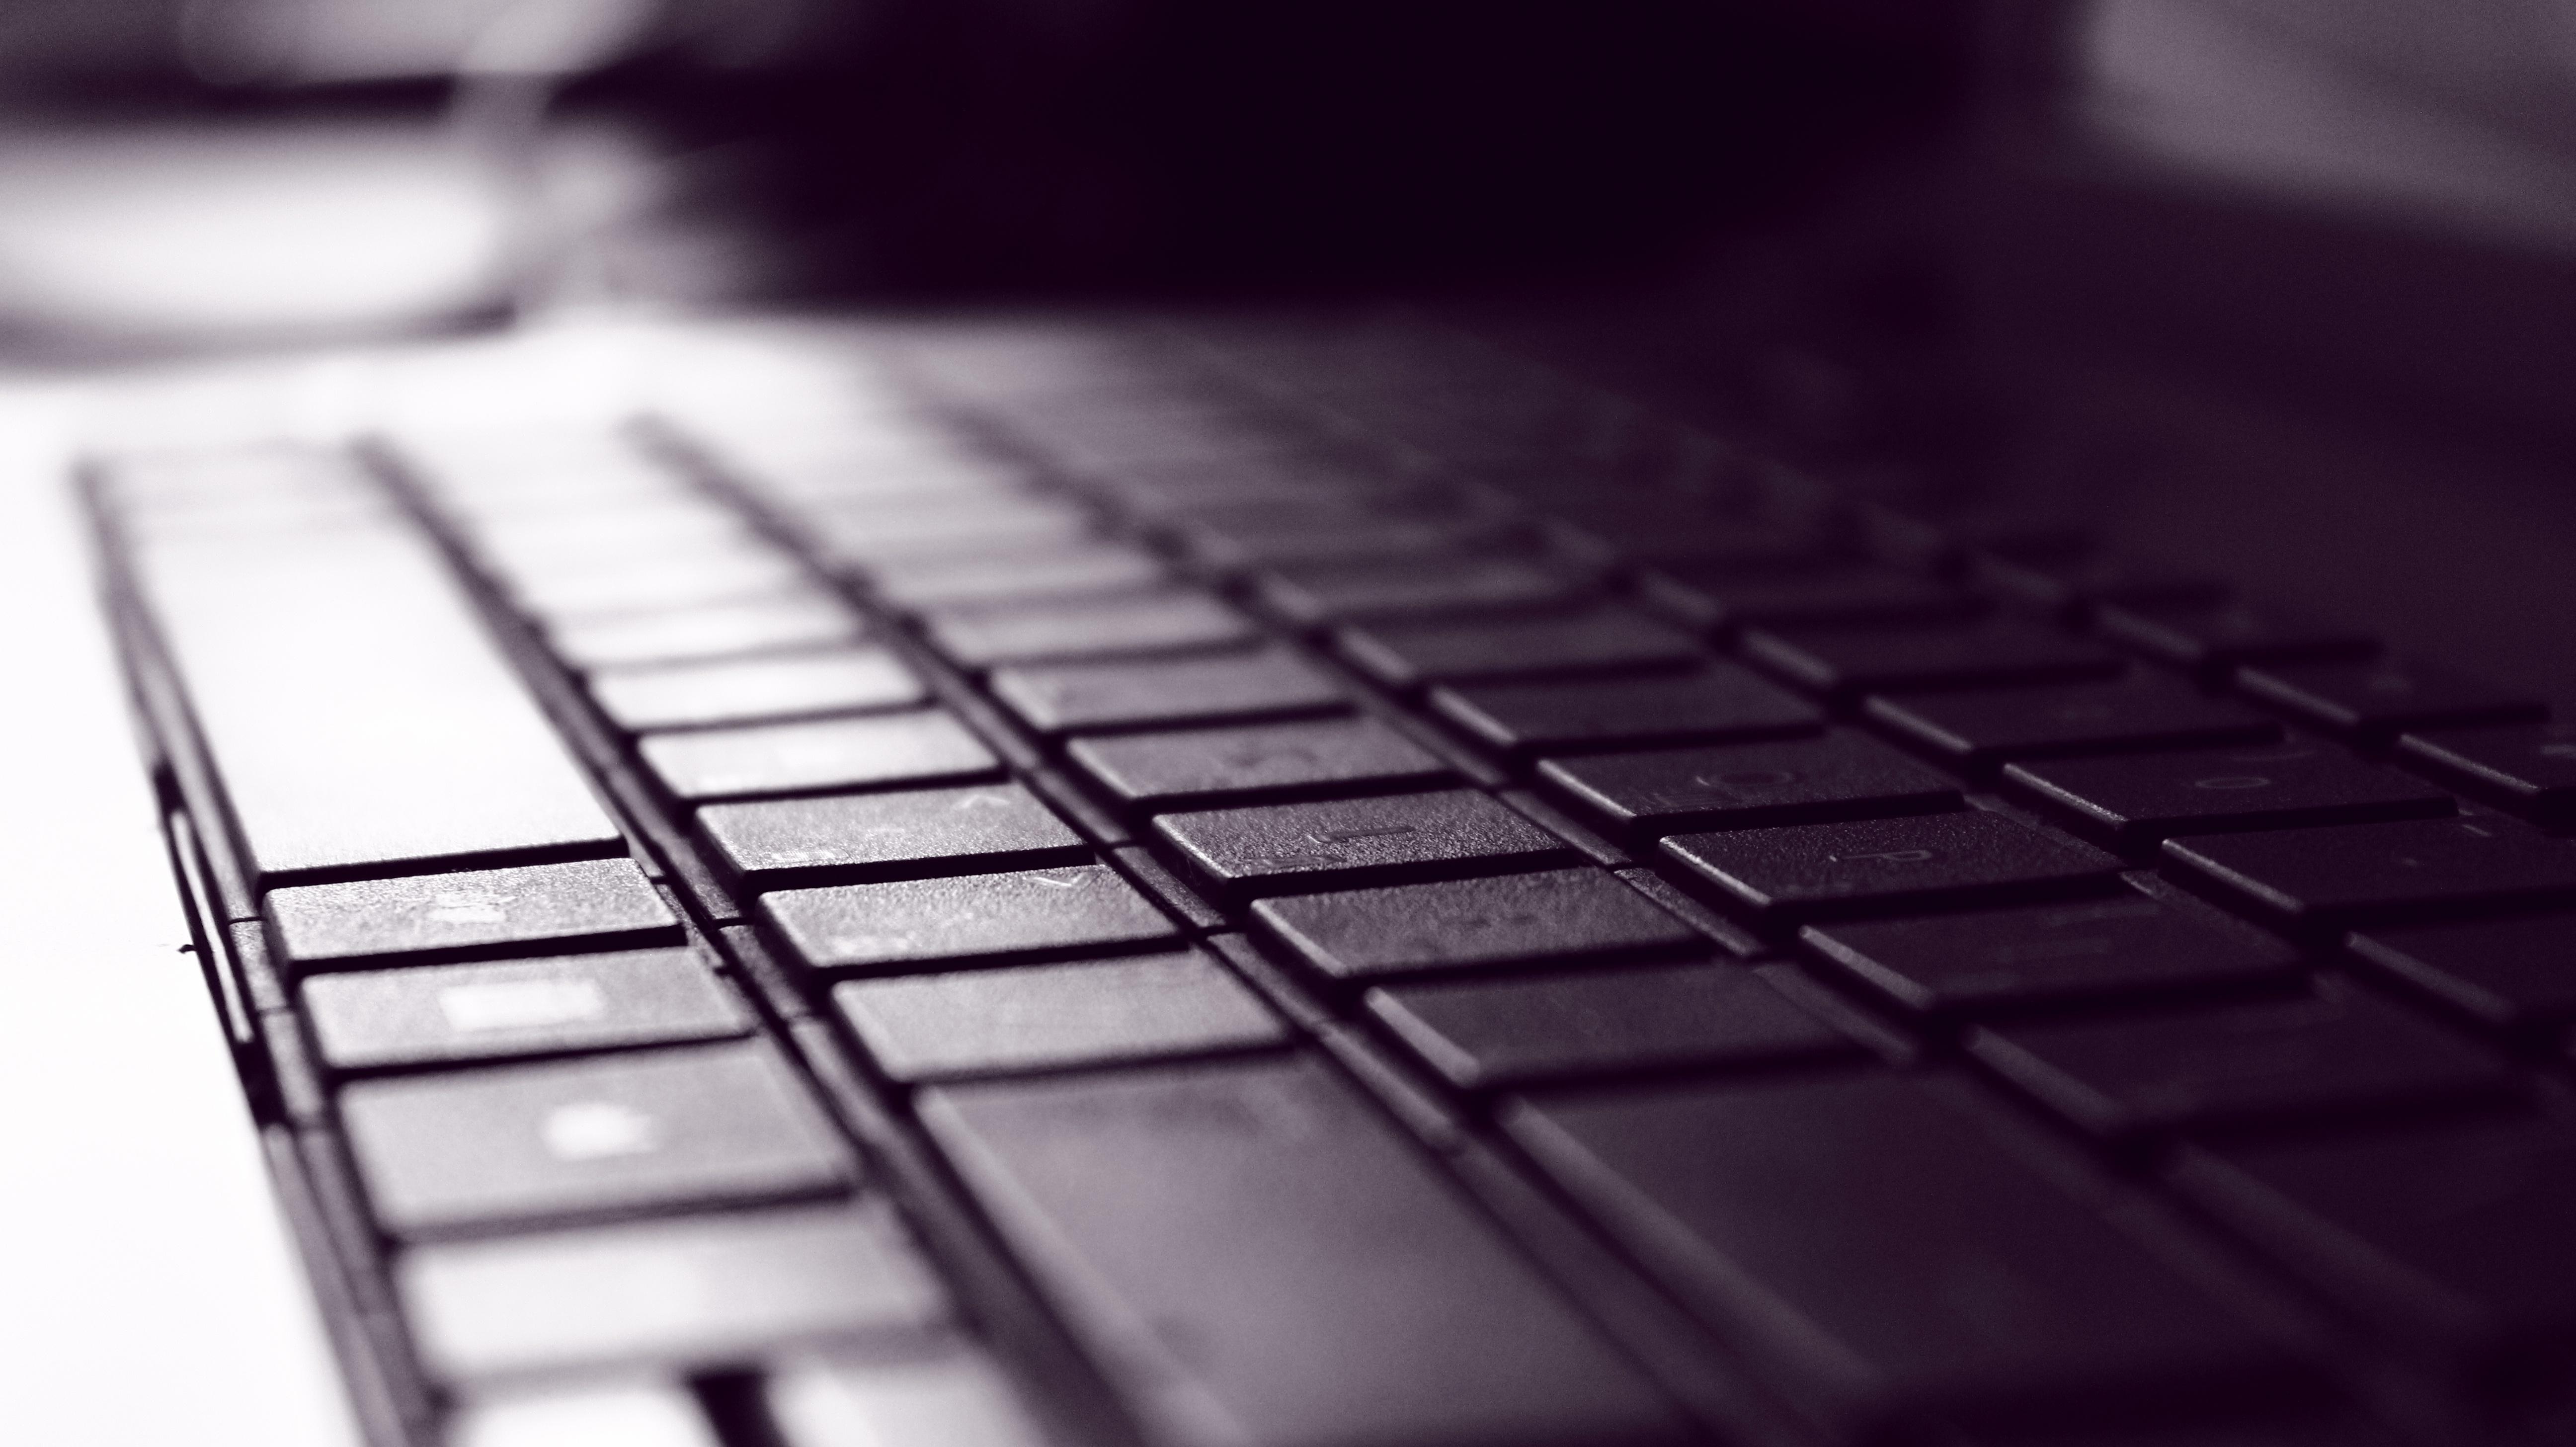 keyboard1.jpeg